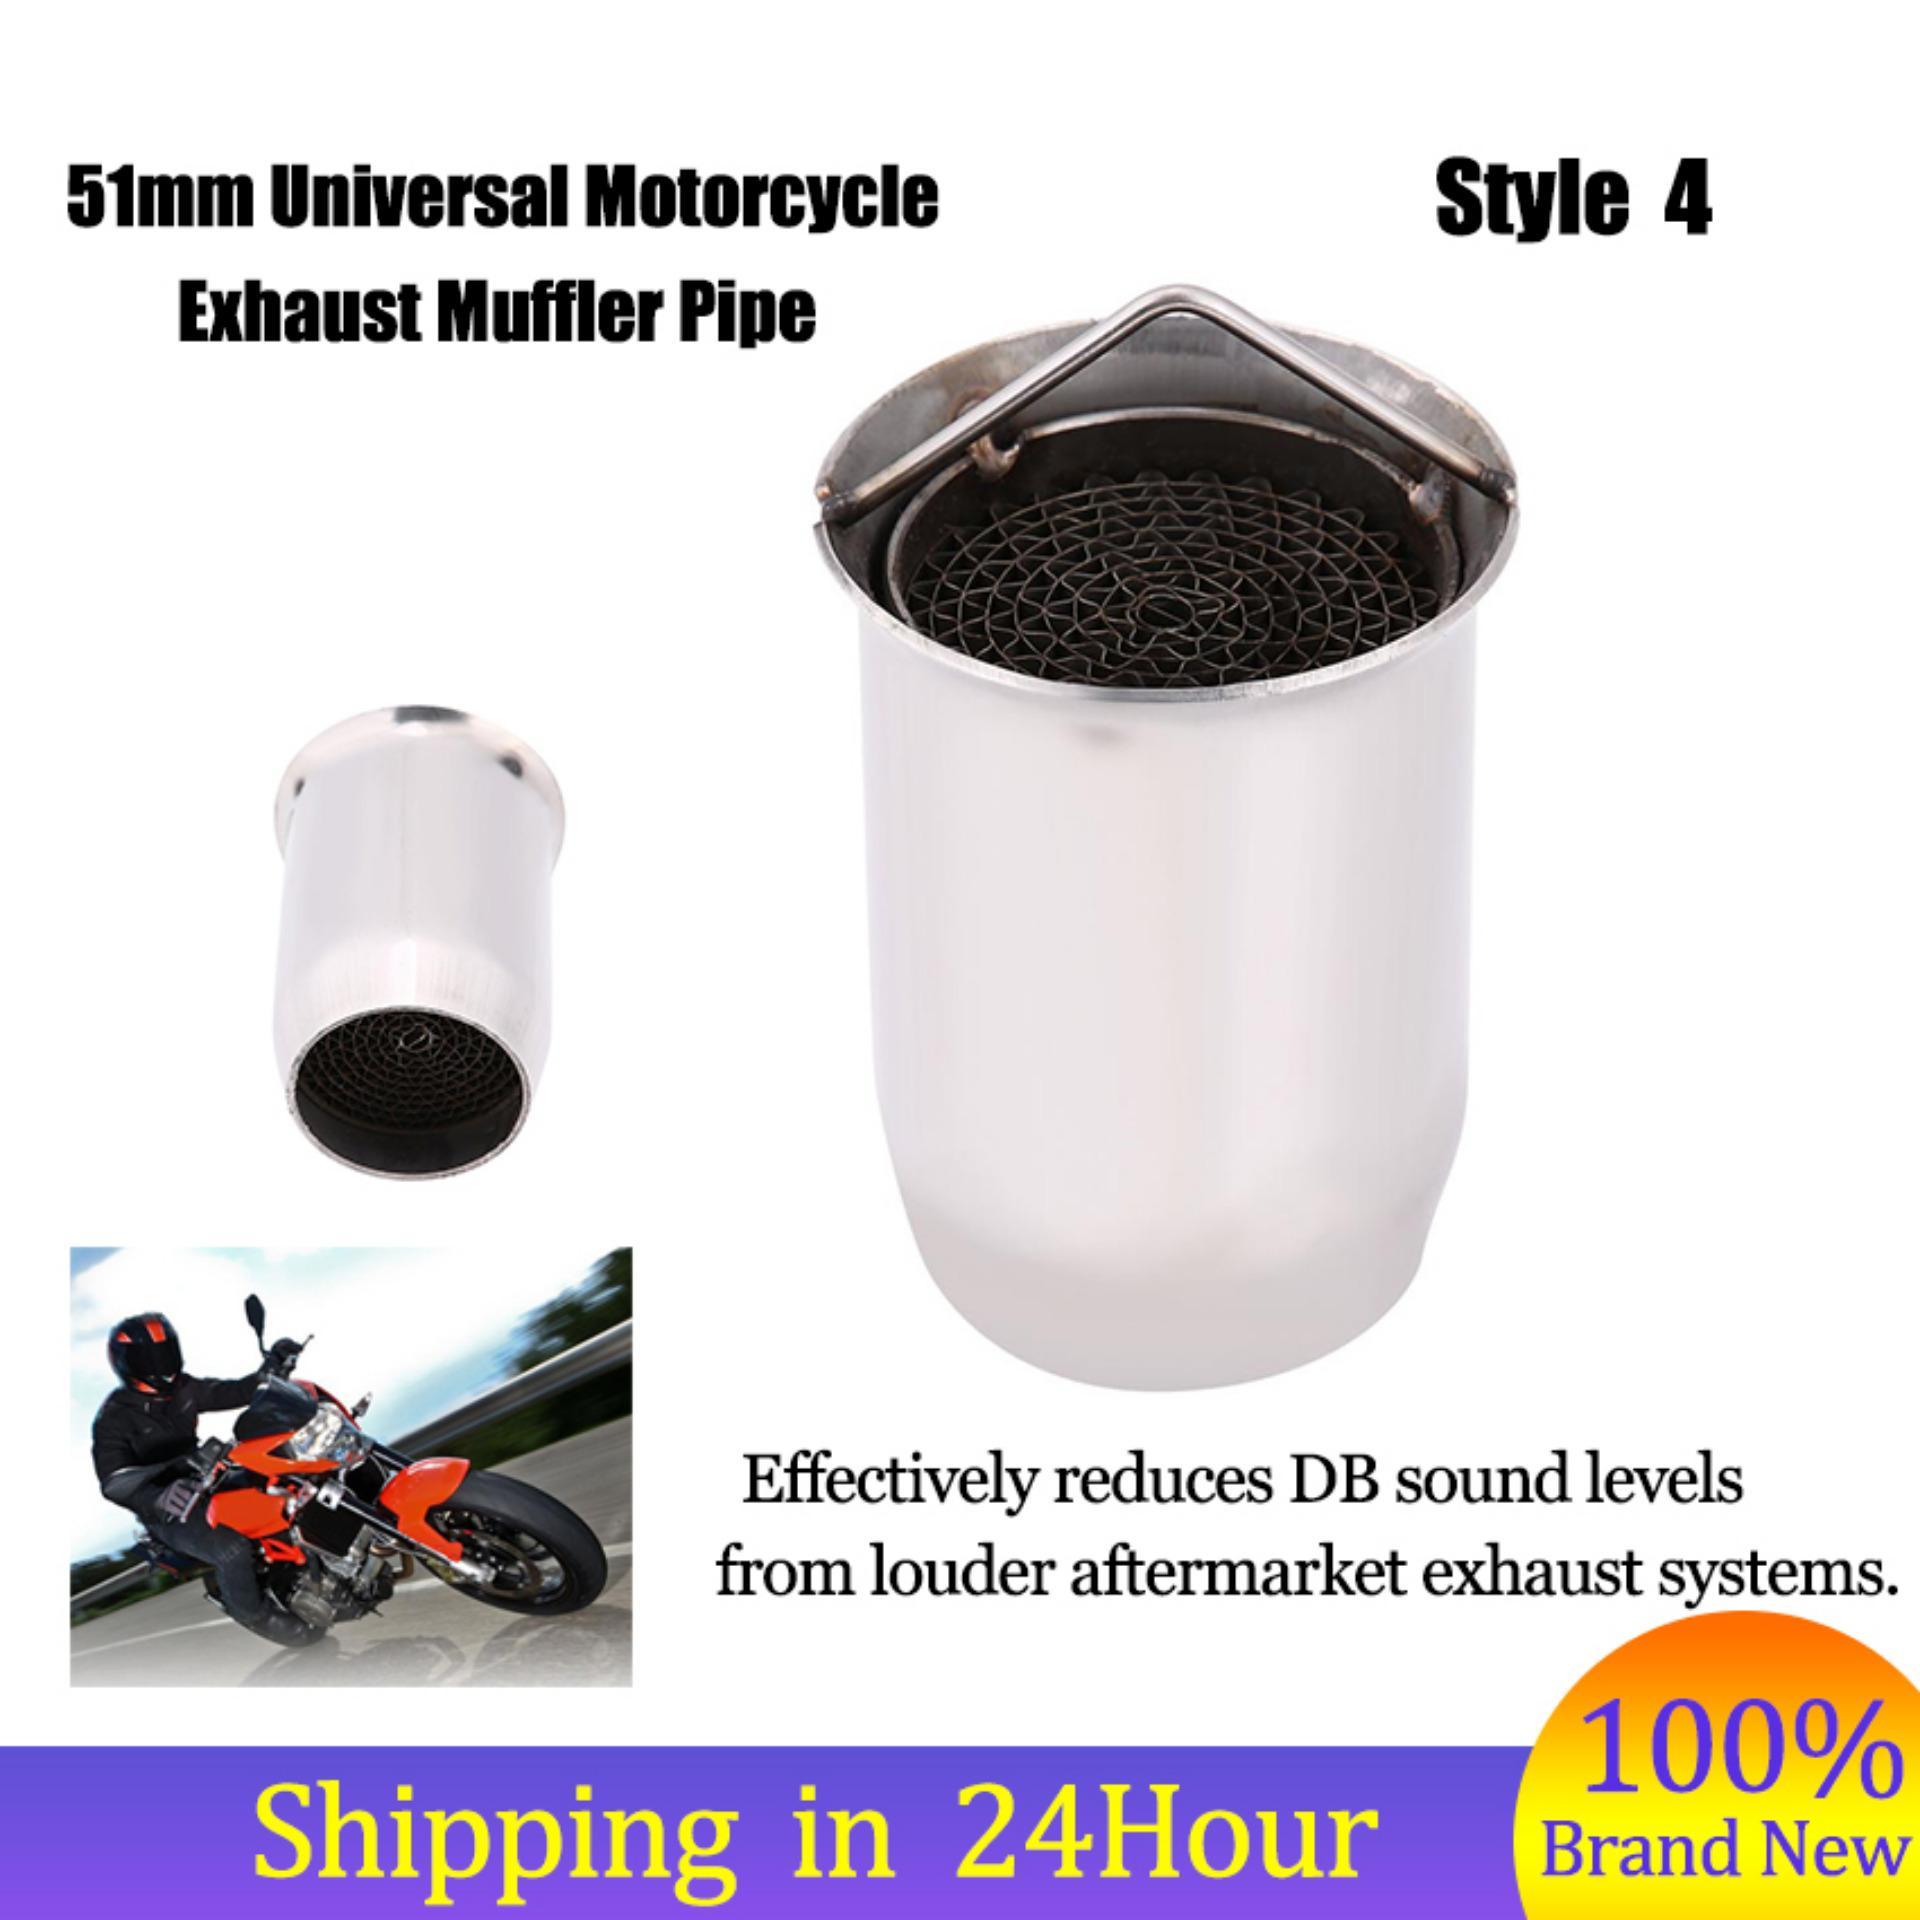 Motorcycle Exhaust Pipe Muffler Silencer DB Killer Noise Eliminator Style4 51mm Universal - intl